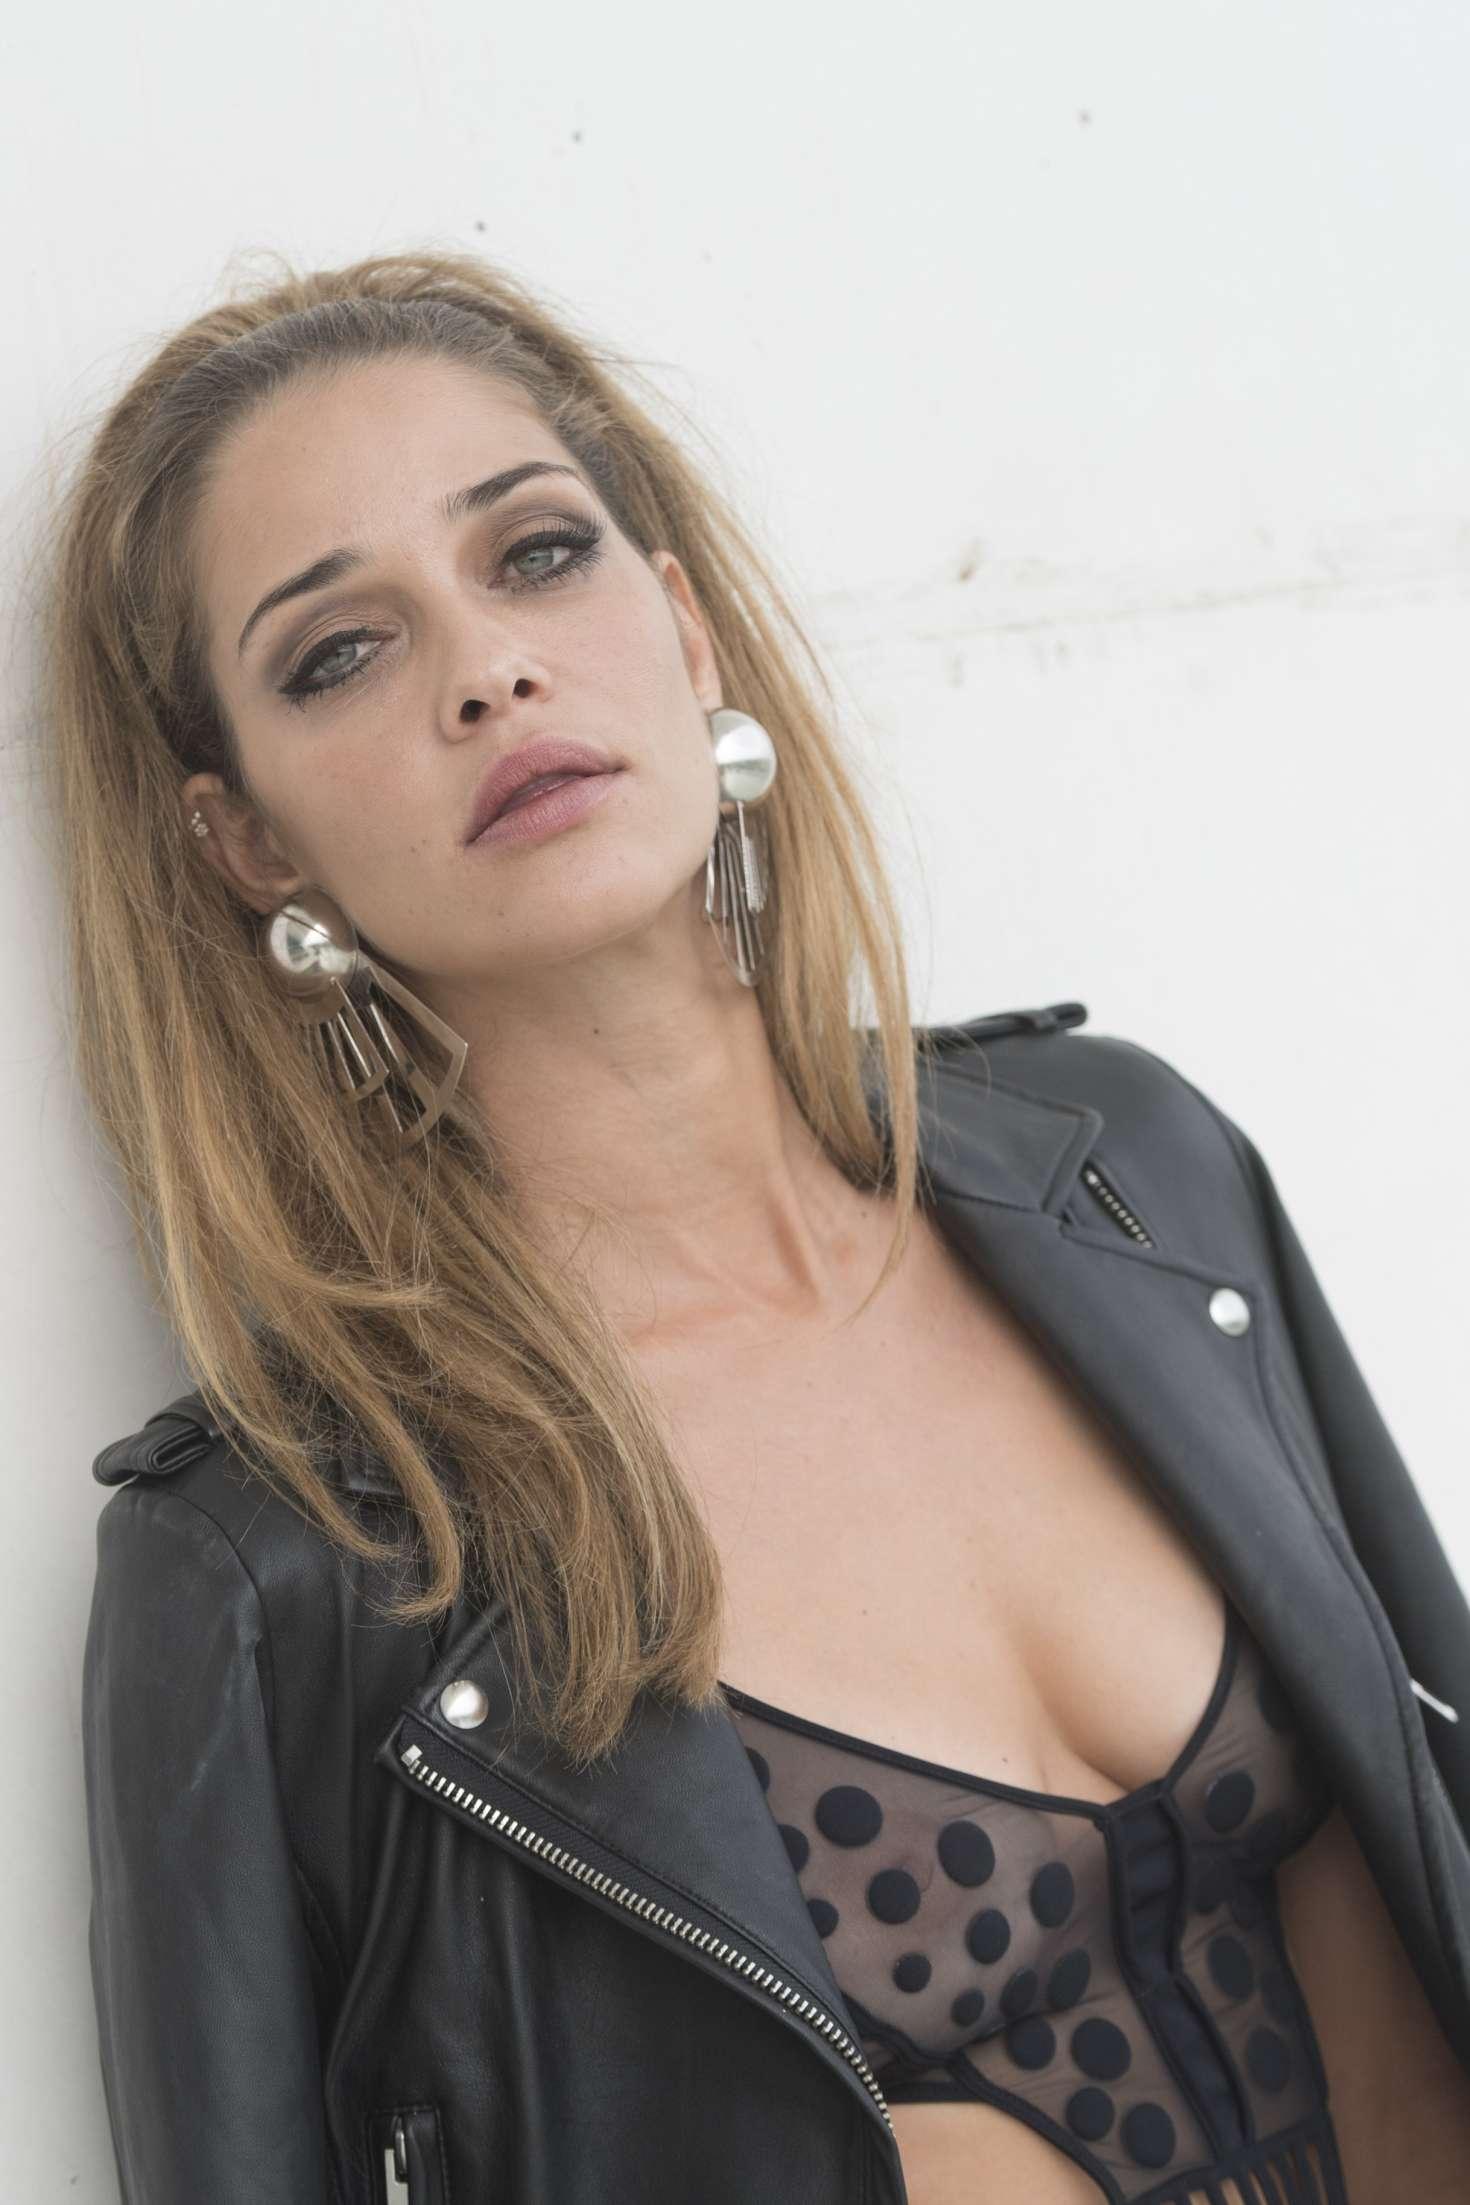 Ana Beatriz Barros nudes (47 photo), Ass, Fappening, Feet, legs 2006